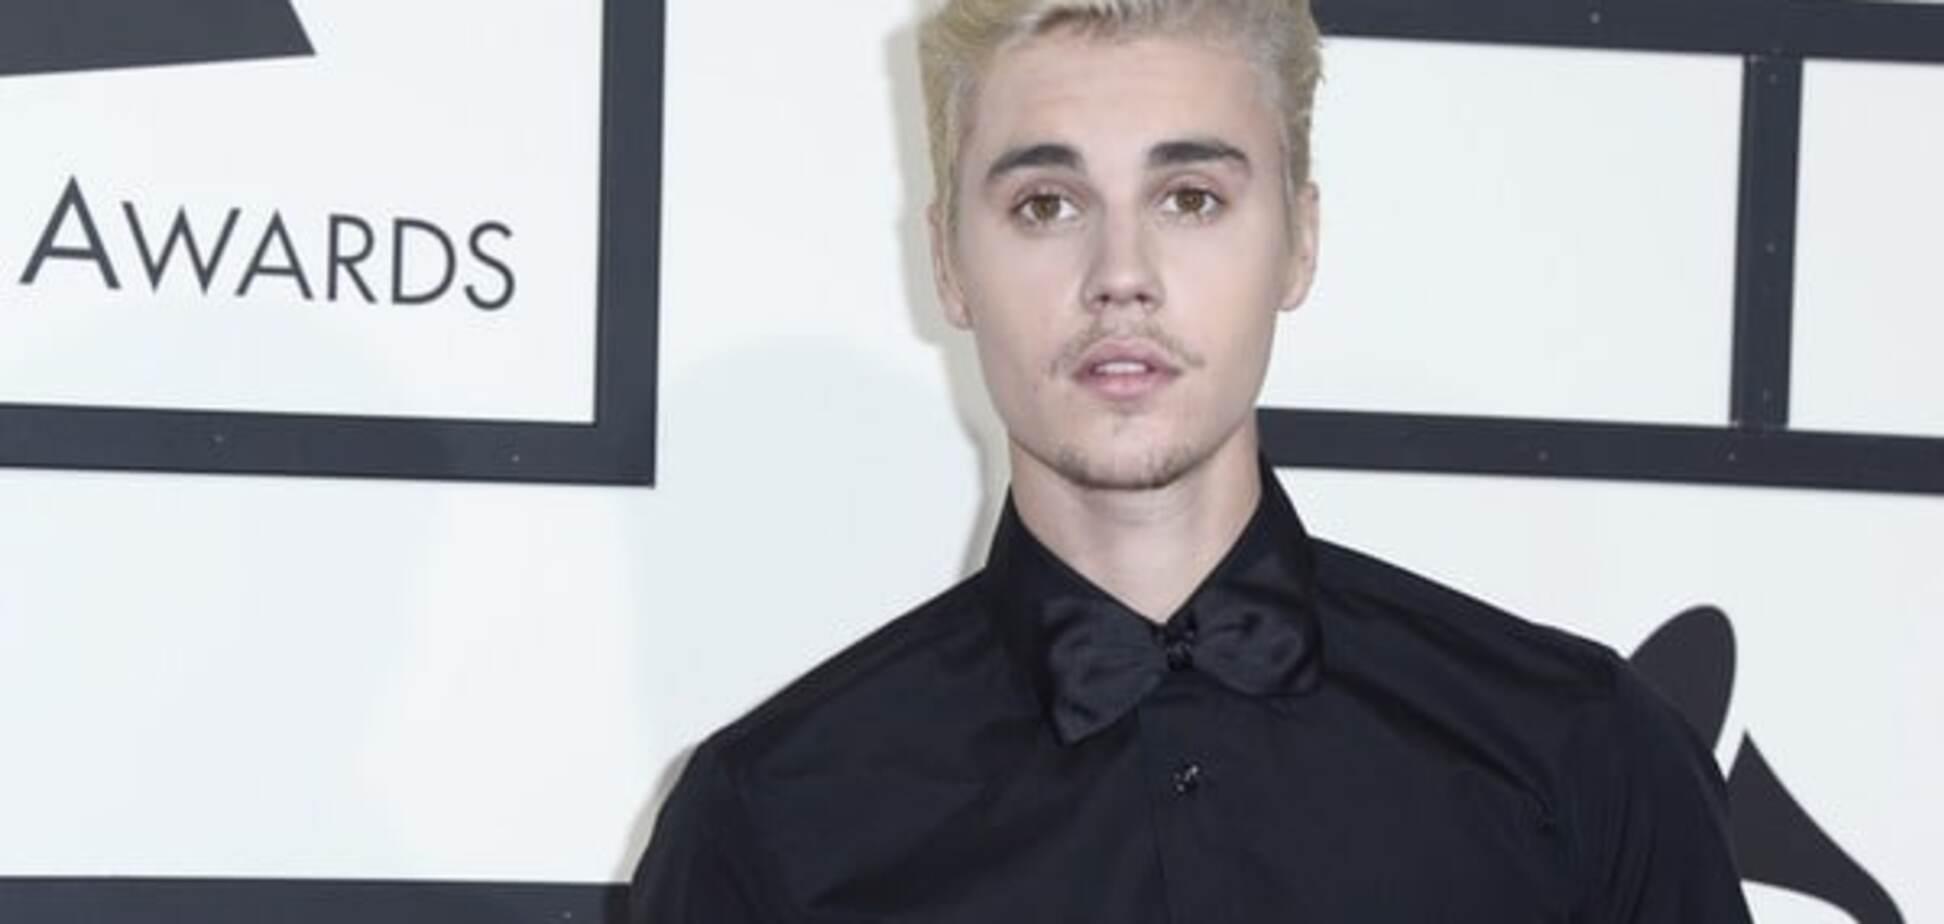 Джастин Бибер привел ребенка на вечеринку Grammy